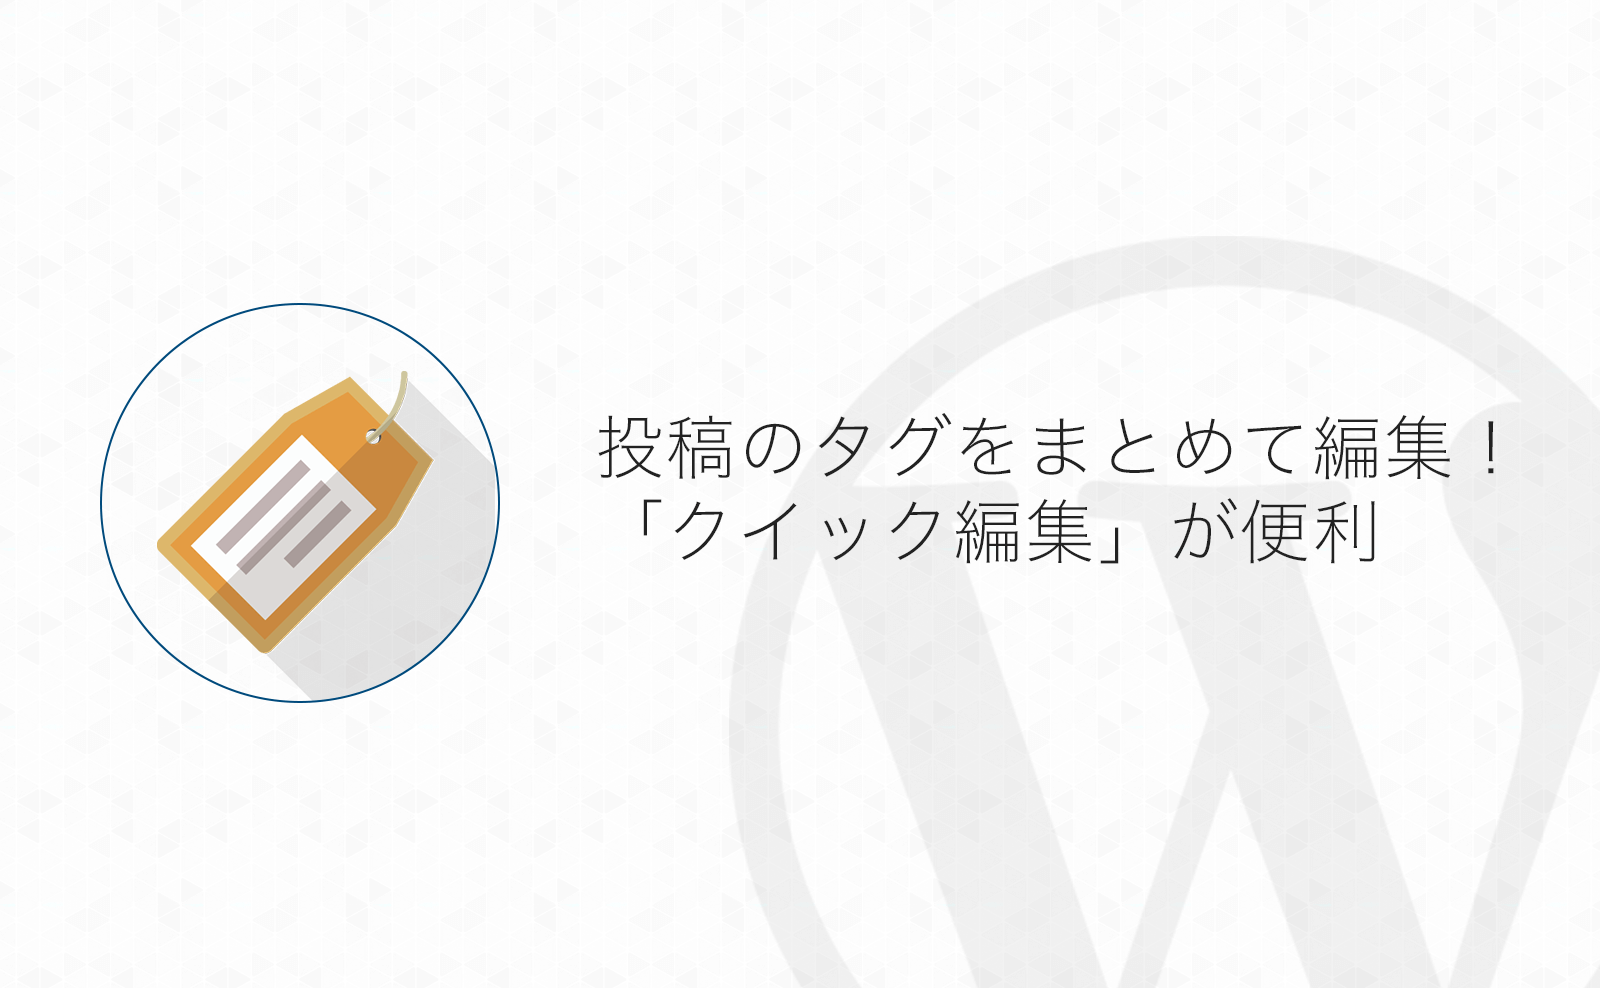 【WordPress】ちょっとした小技!タグの一括編集には「クイック編集」が便利